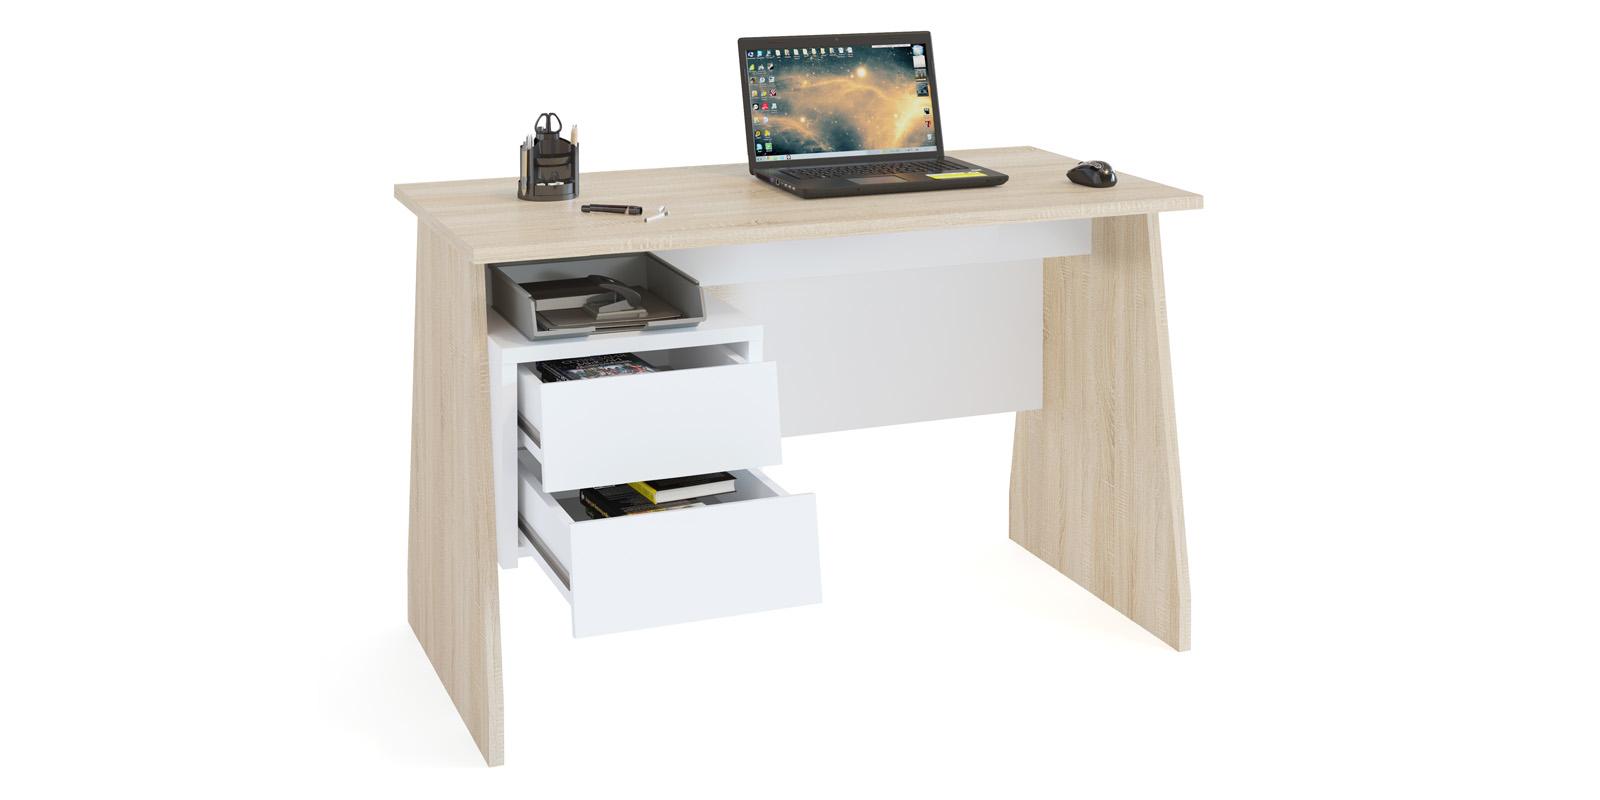 Стол компьютерный Савона (дуб сонома/белый)